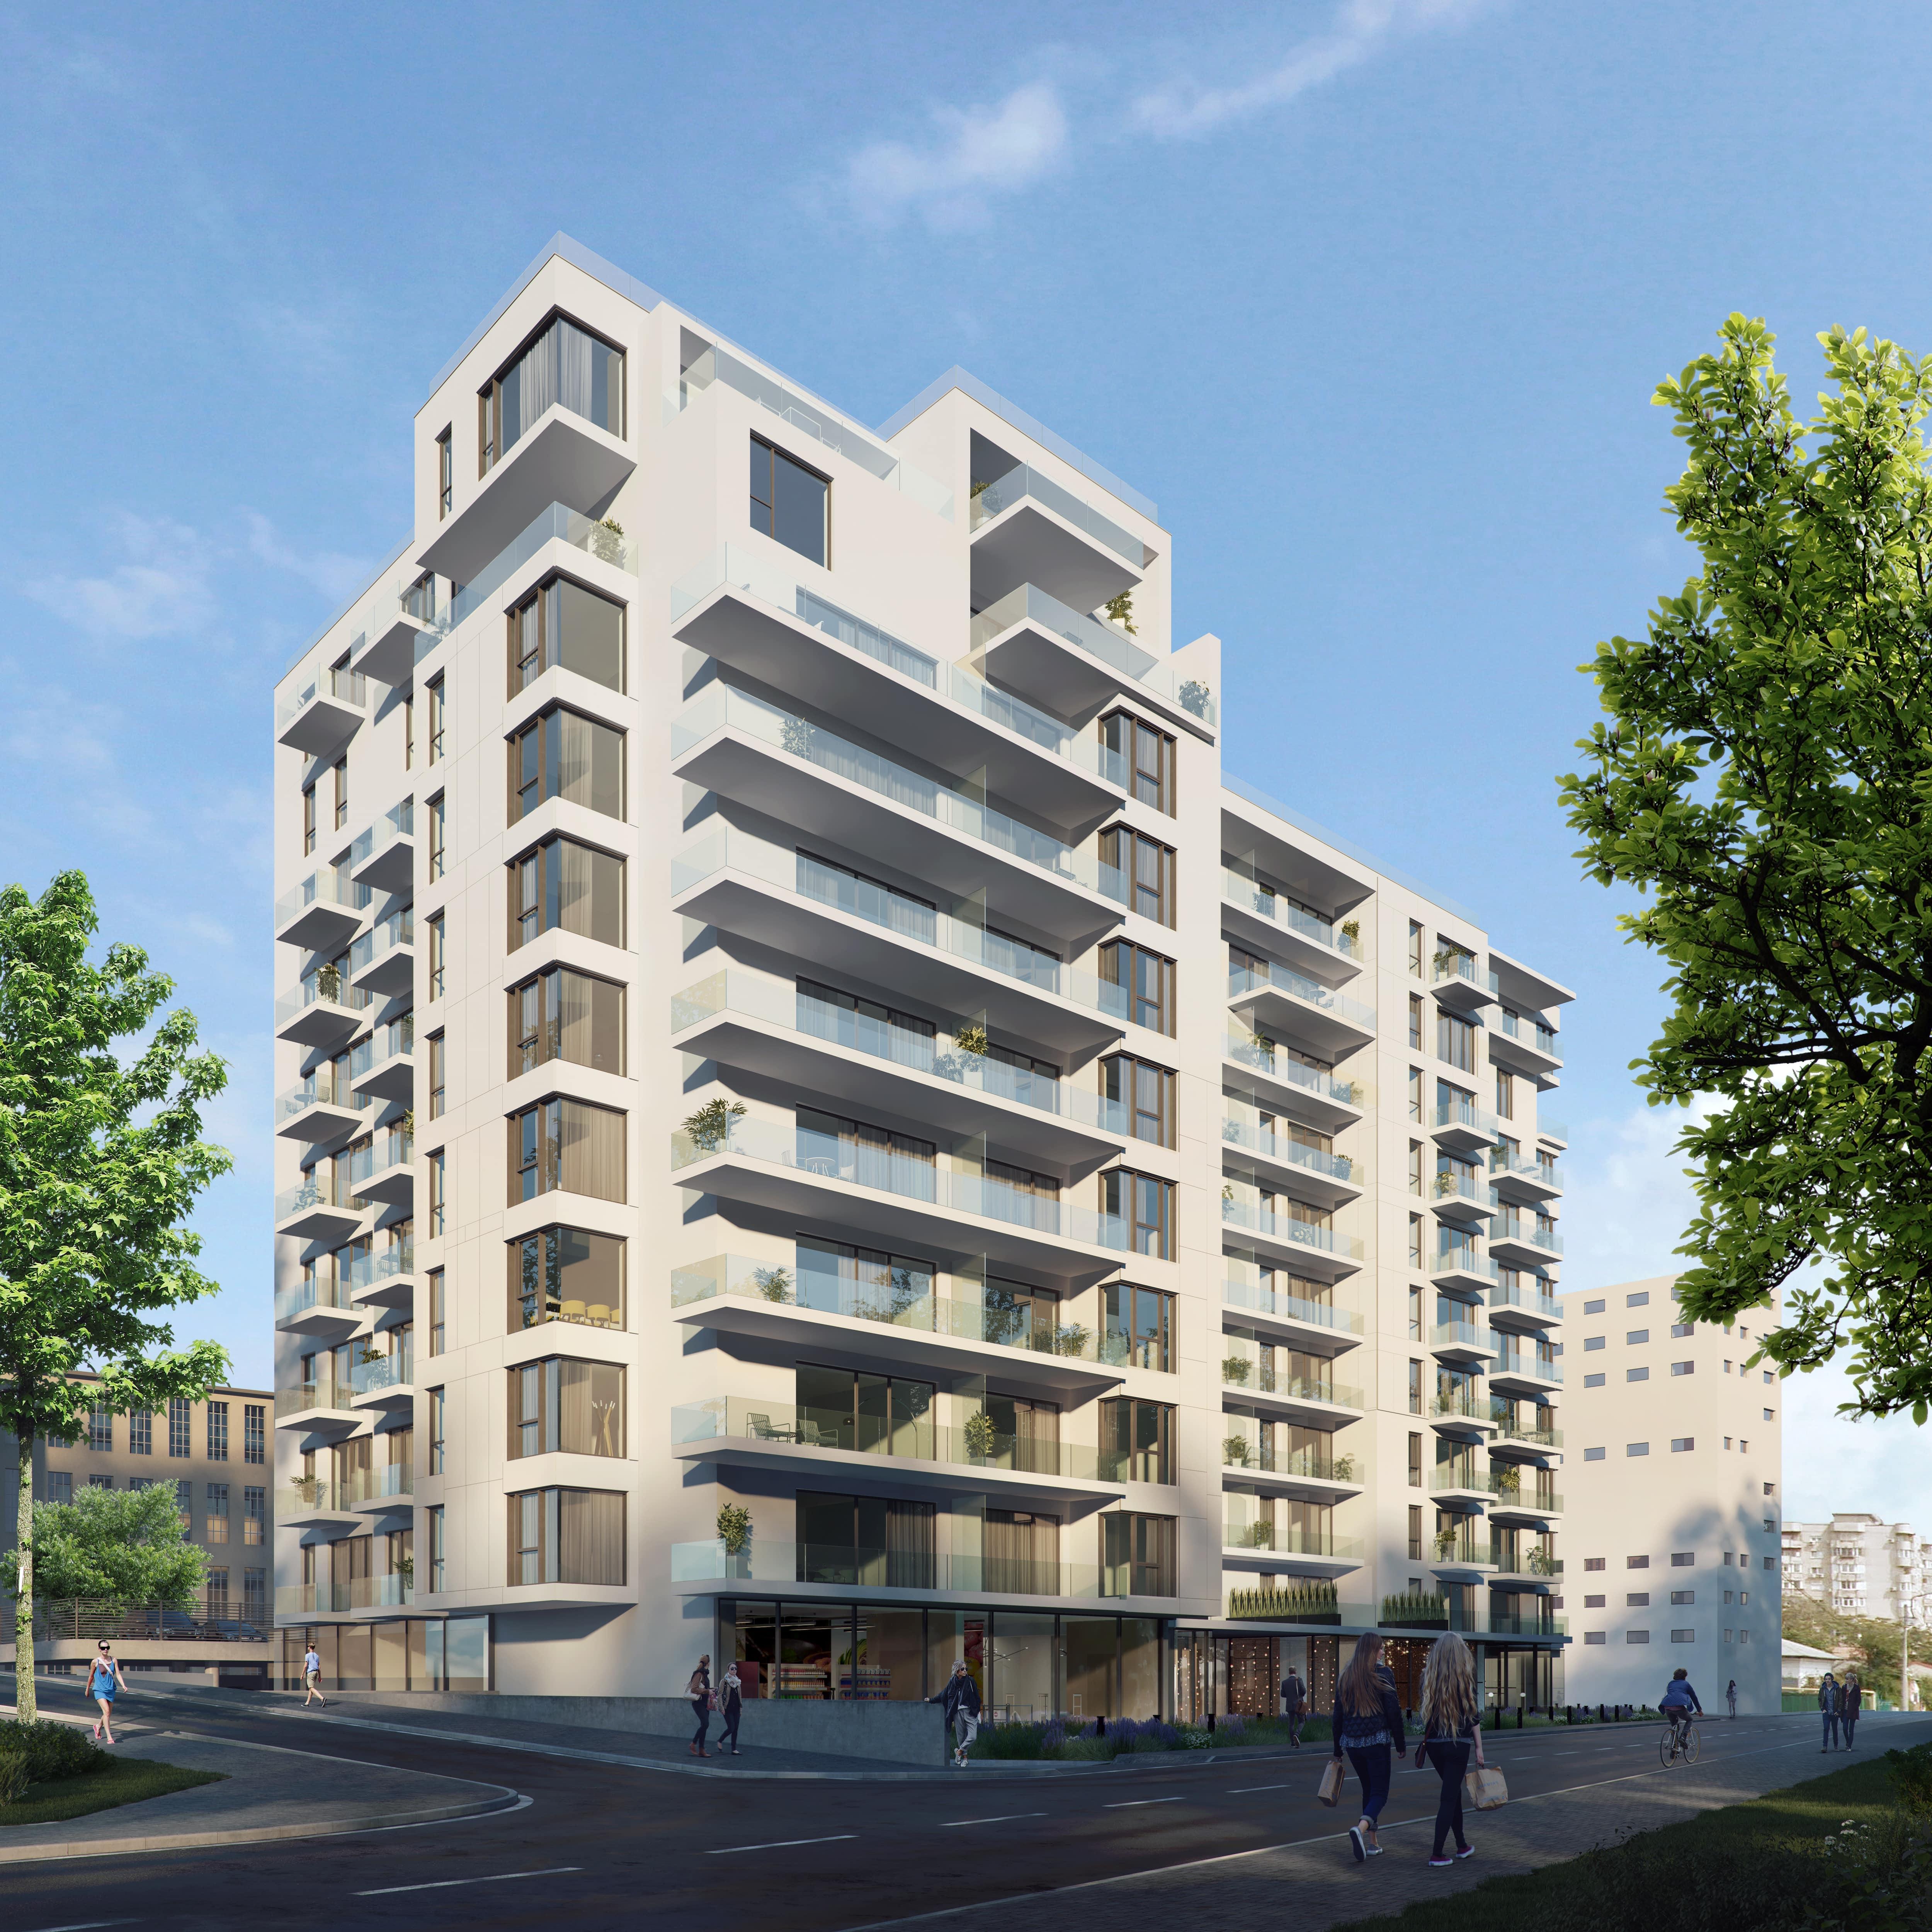 https://ahe-ro.s3.amazonaws.com/8055/penthouse-si-apartamente-unirii-%286%29.jpg